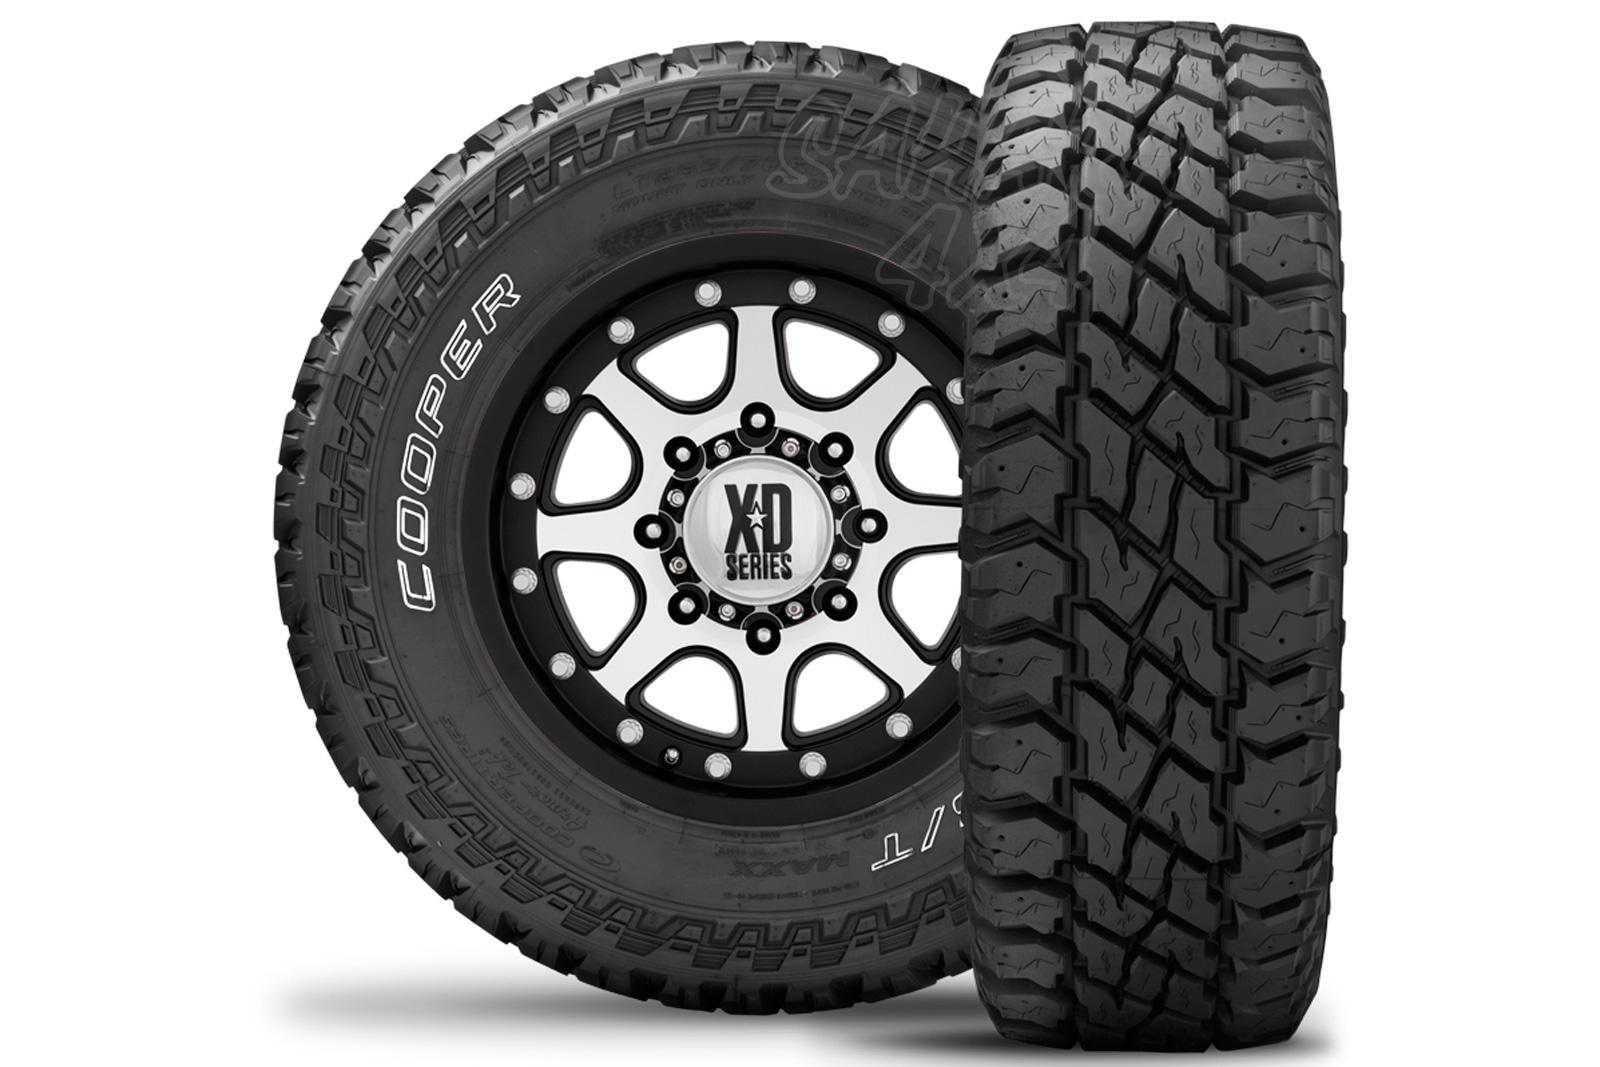 cooper tires st maxx 60 40. Black Bedroom Furniture Sets. Home Design Ideas